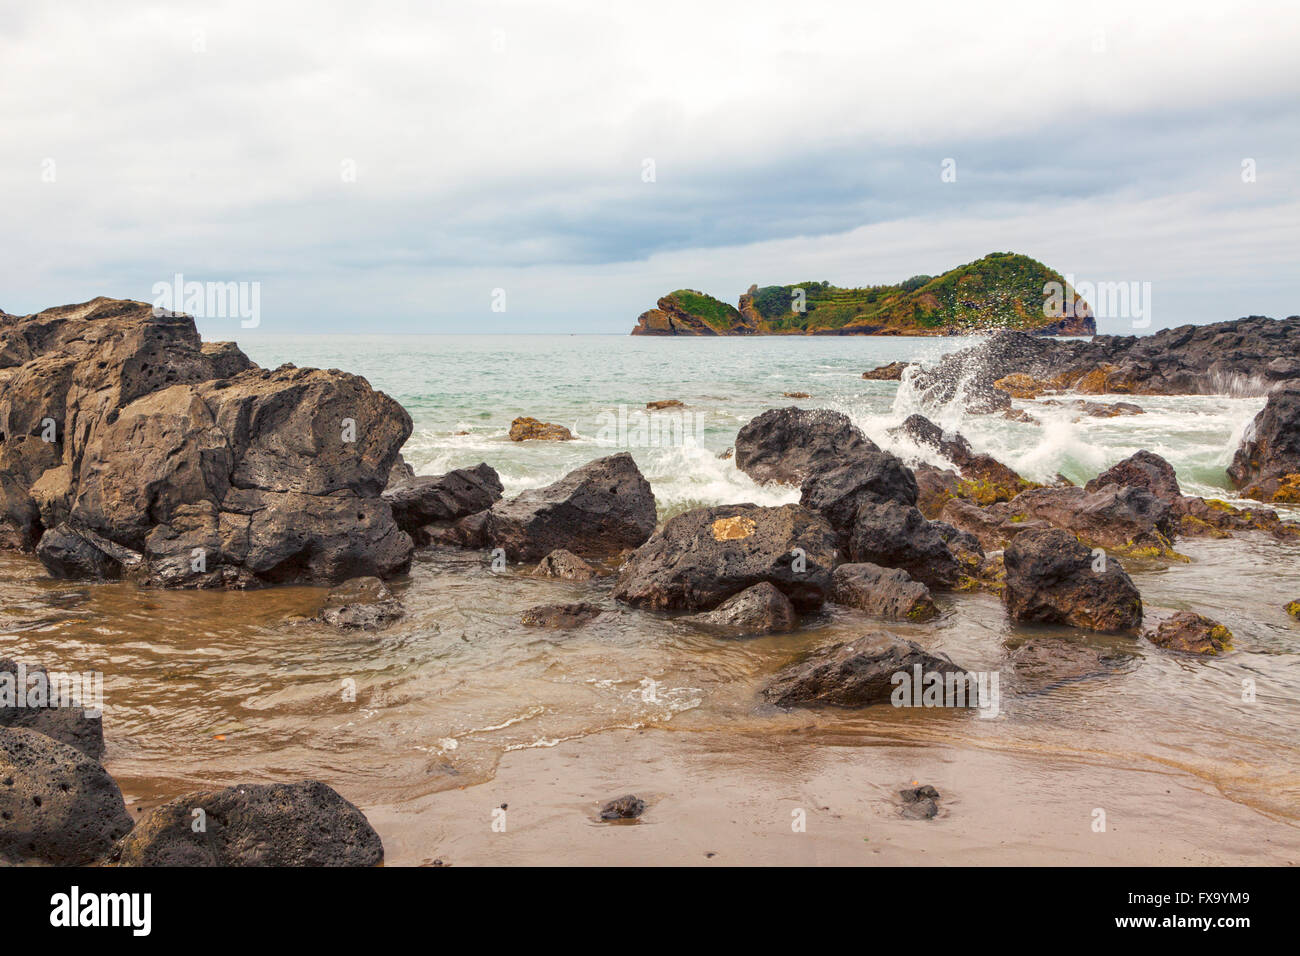 Ilheu de Vila Franca and rocky coast of Sao Miguel island - Stock Image